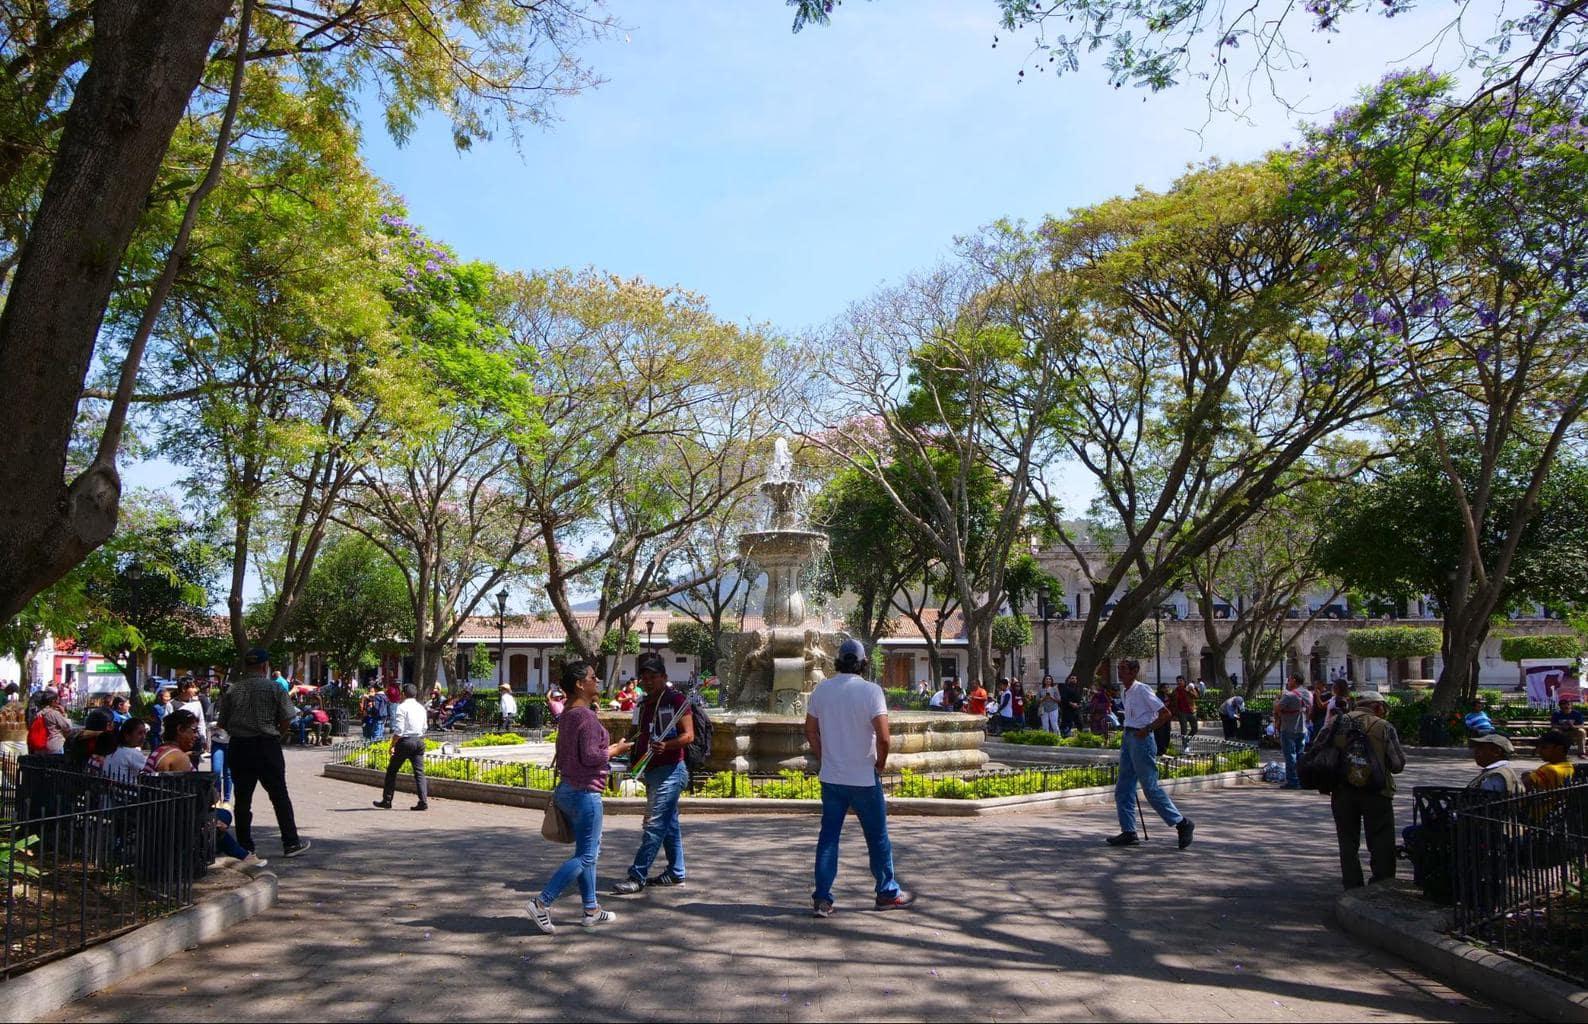 Antigua Guatemala Central Park or Plaza Mayor